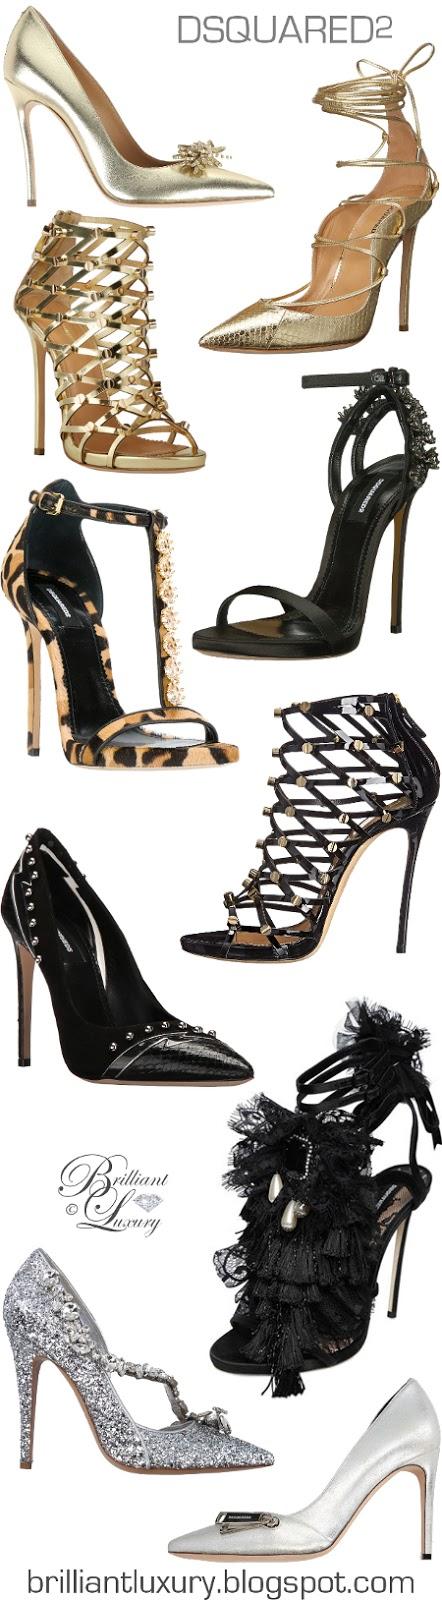 Brilliant Luxury ♦ Dsquared2 fabulous heels part 2